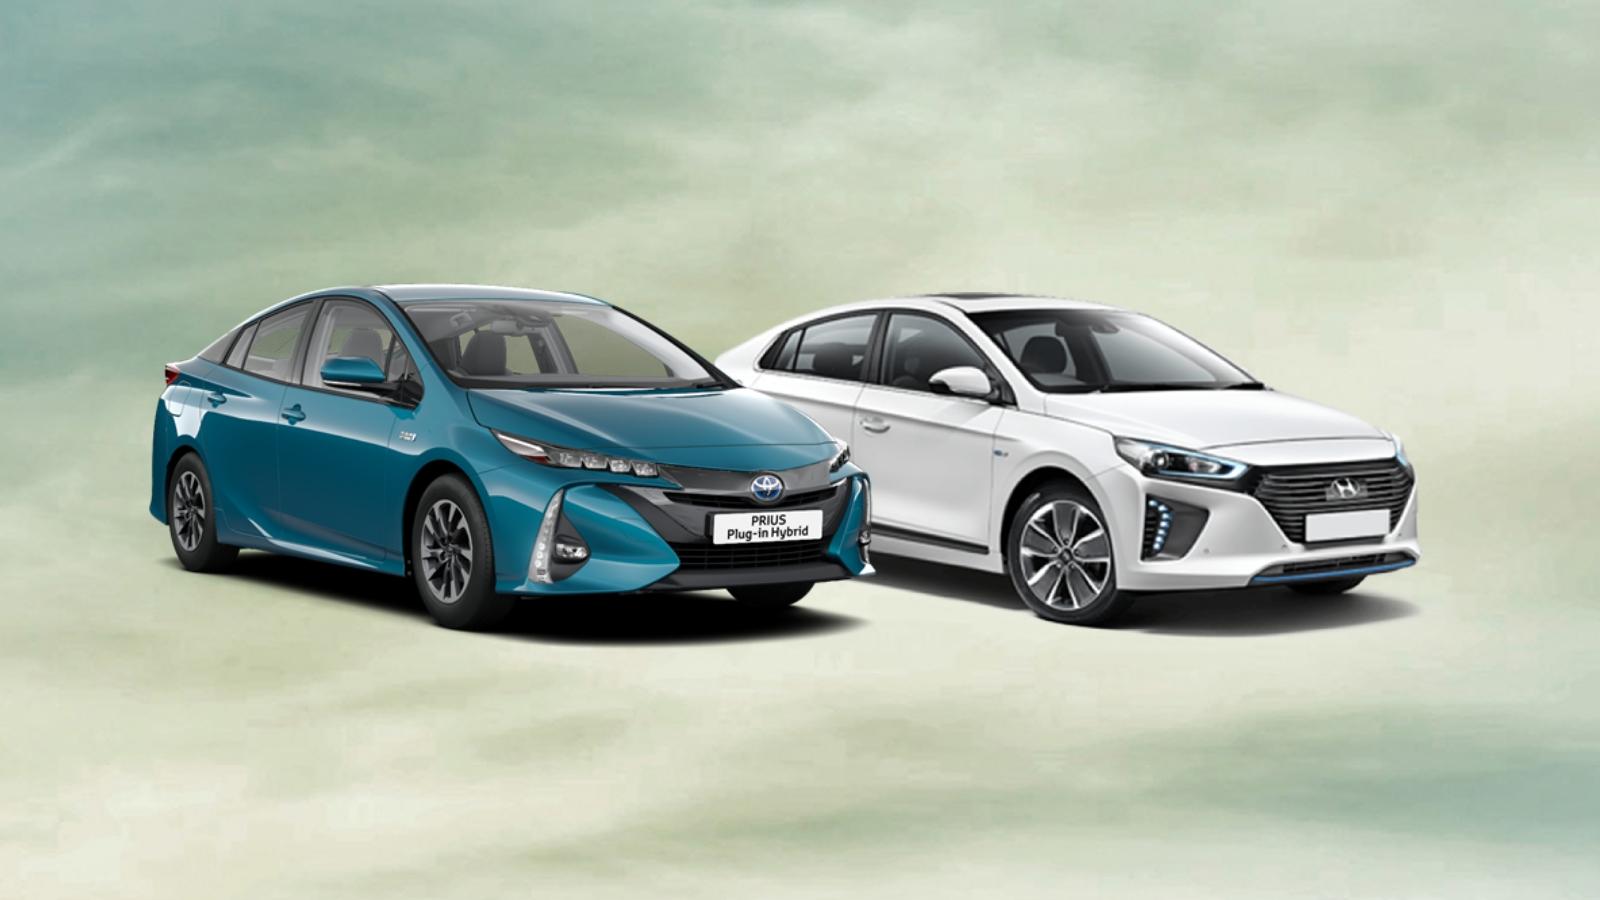 Toyota Prius PHEV versus Hyundai Ioniq PHEV